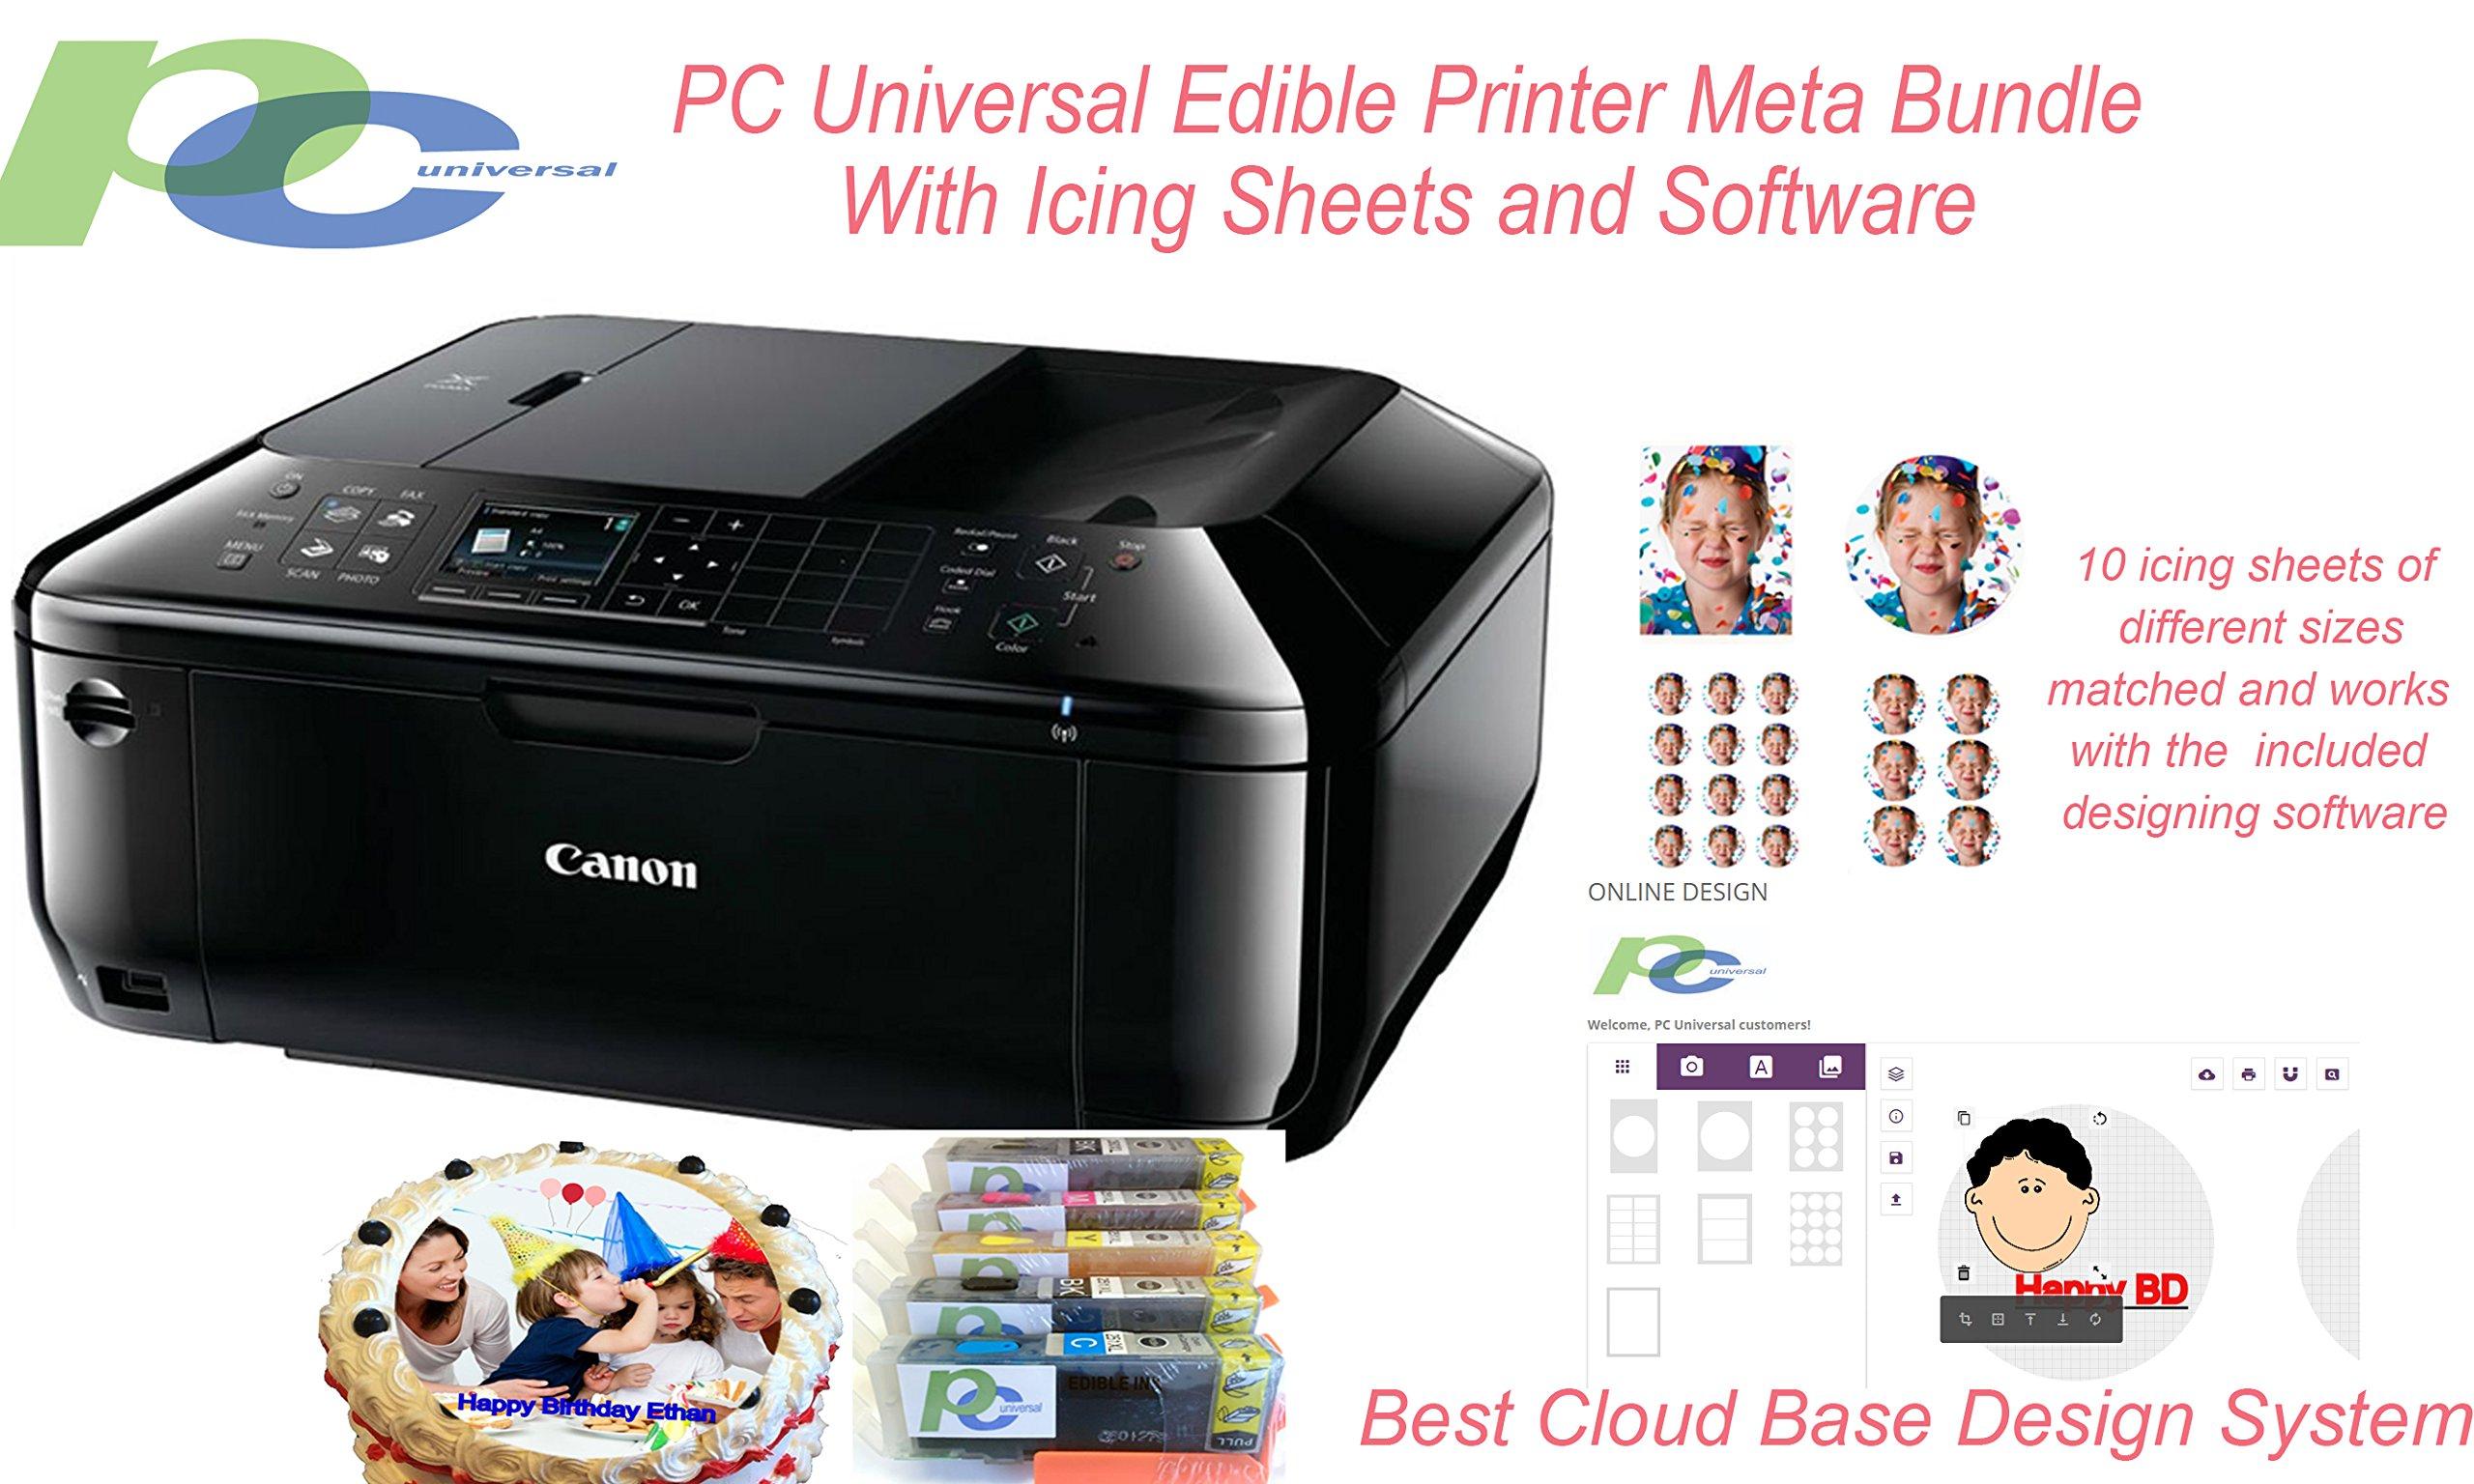 PC Universal Edible Printer Meta Bundle With Icing Sheets and Software